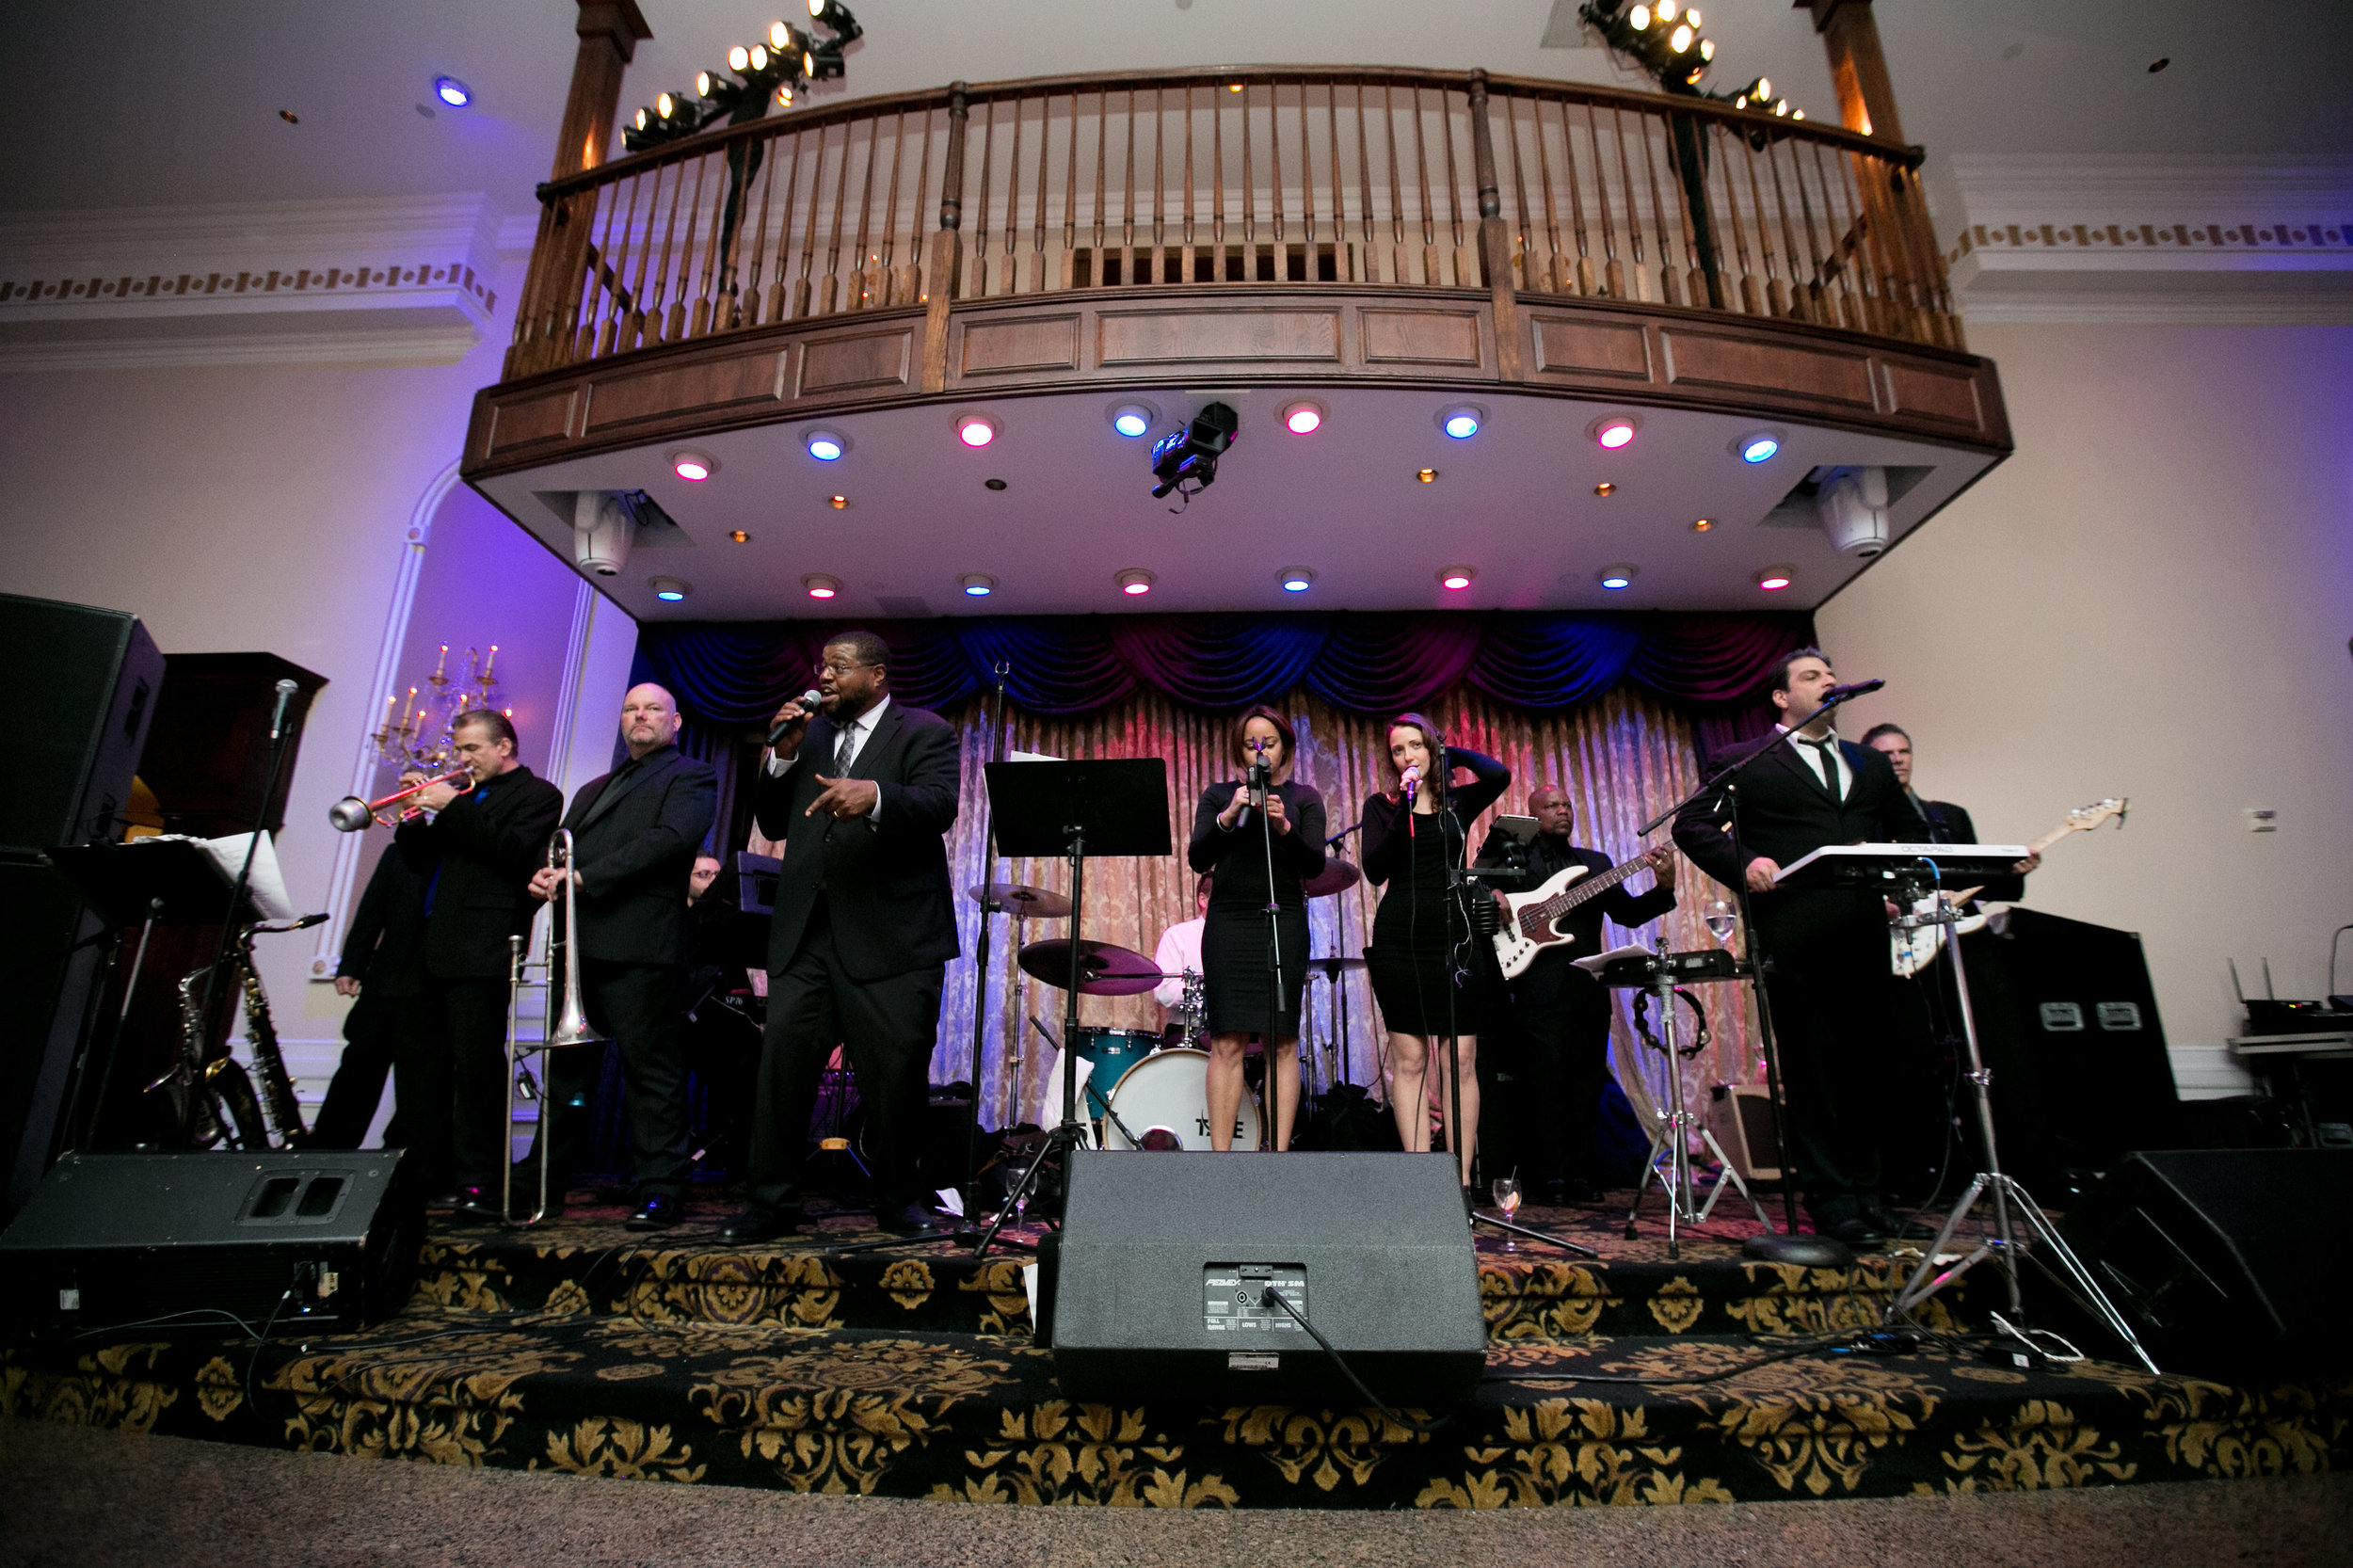 Ceci_New_York_Custom_Invitation_ New_Jersey_Wedding_Luxury_Personalized_Ceci_Style_Bride_Foil_Stamping75.jpg